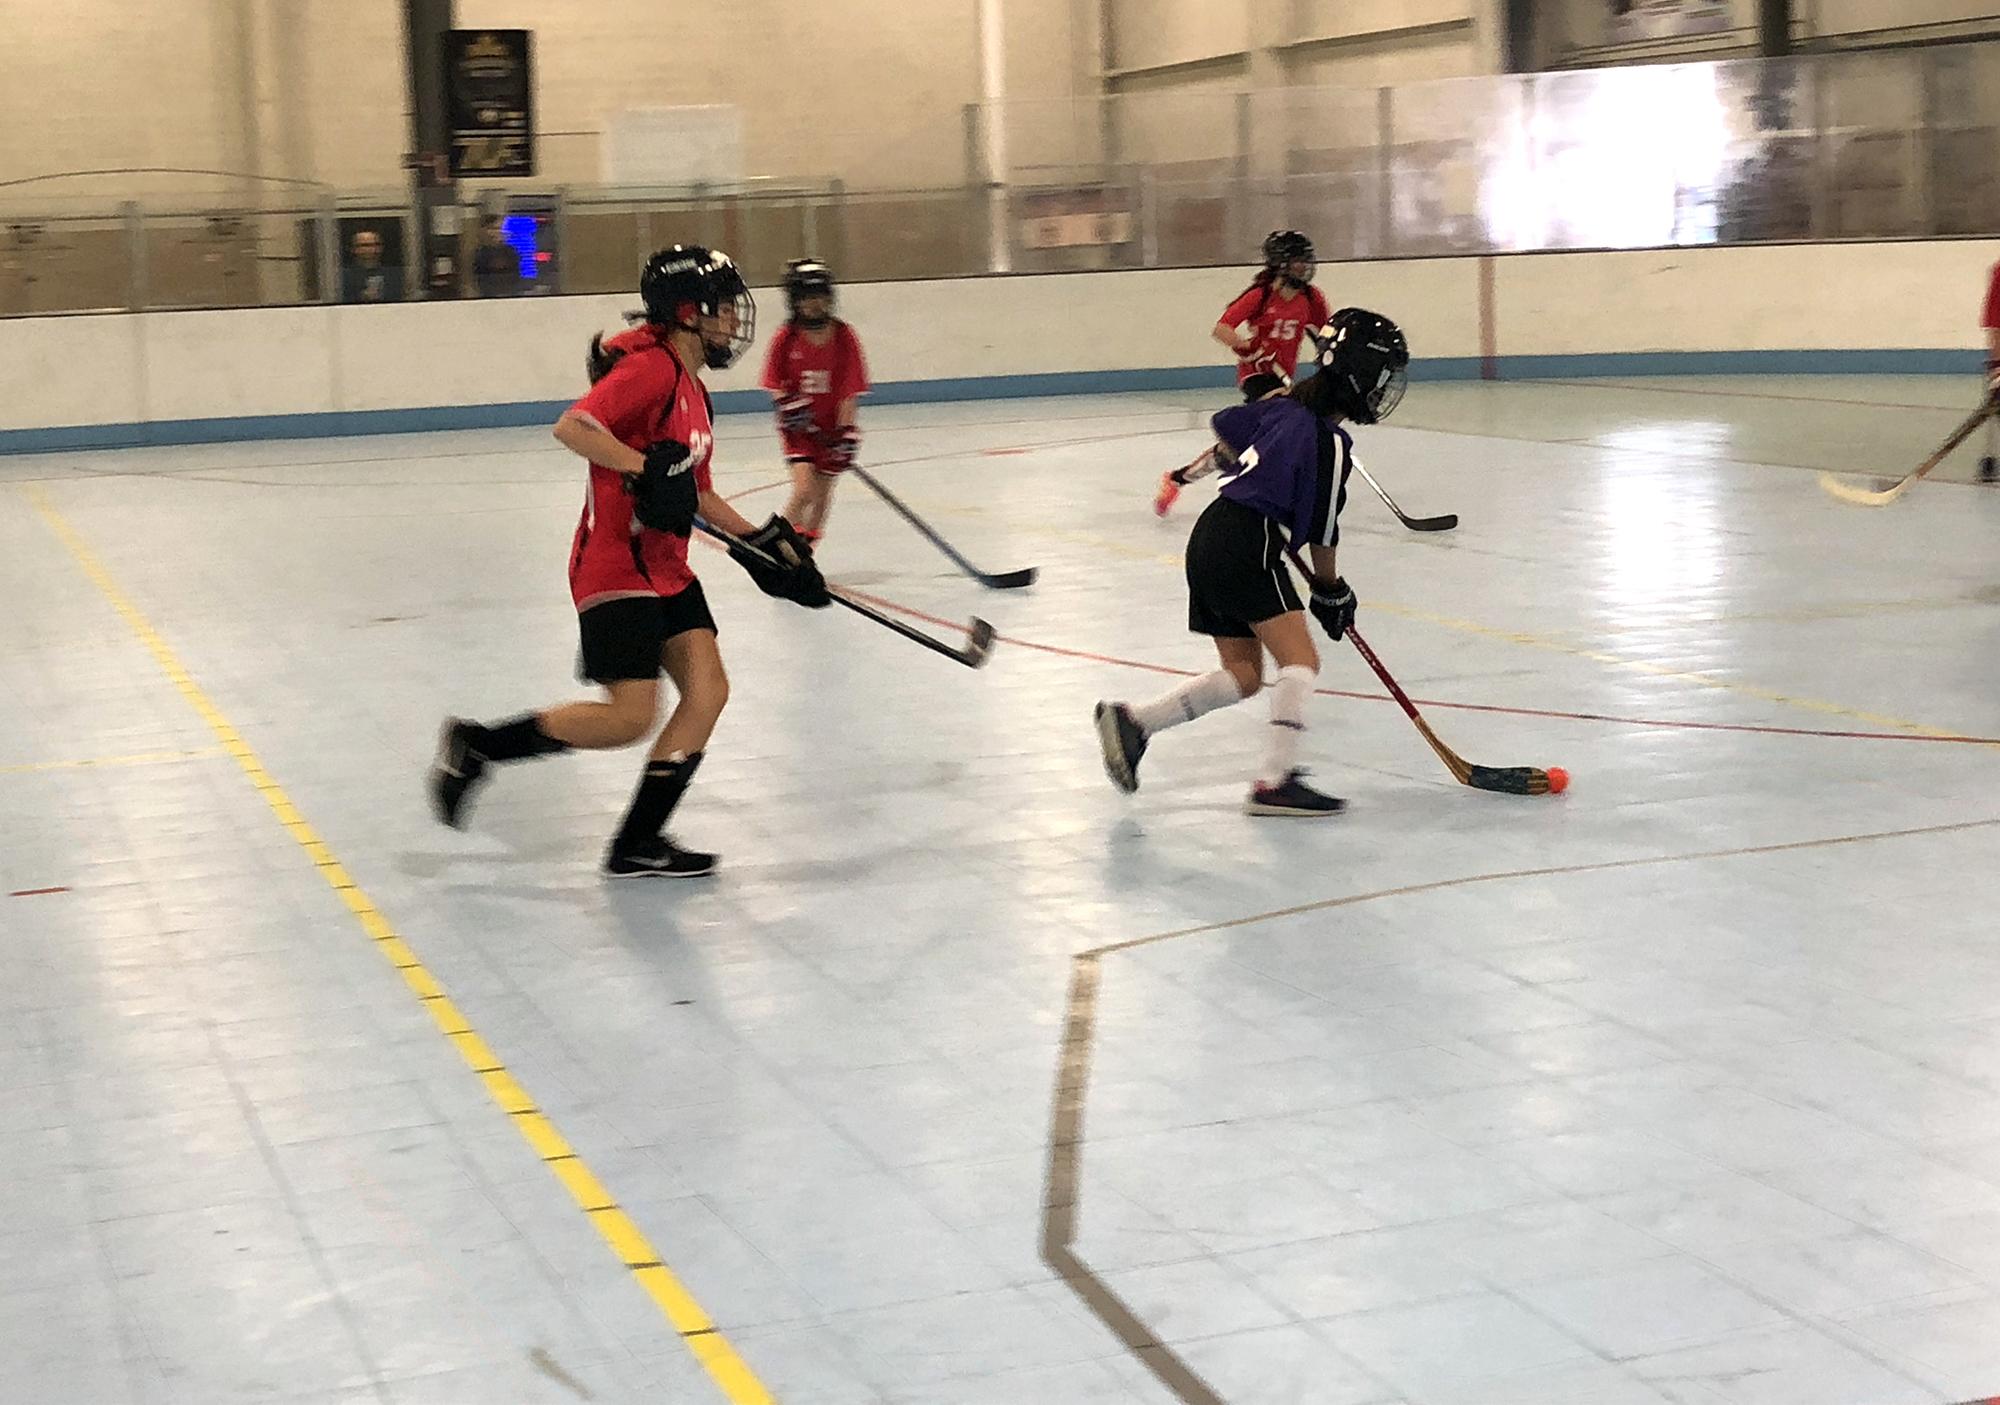 BallHockey_2018_6.jpg